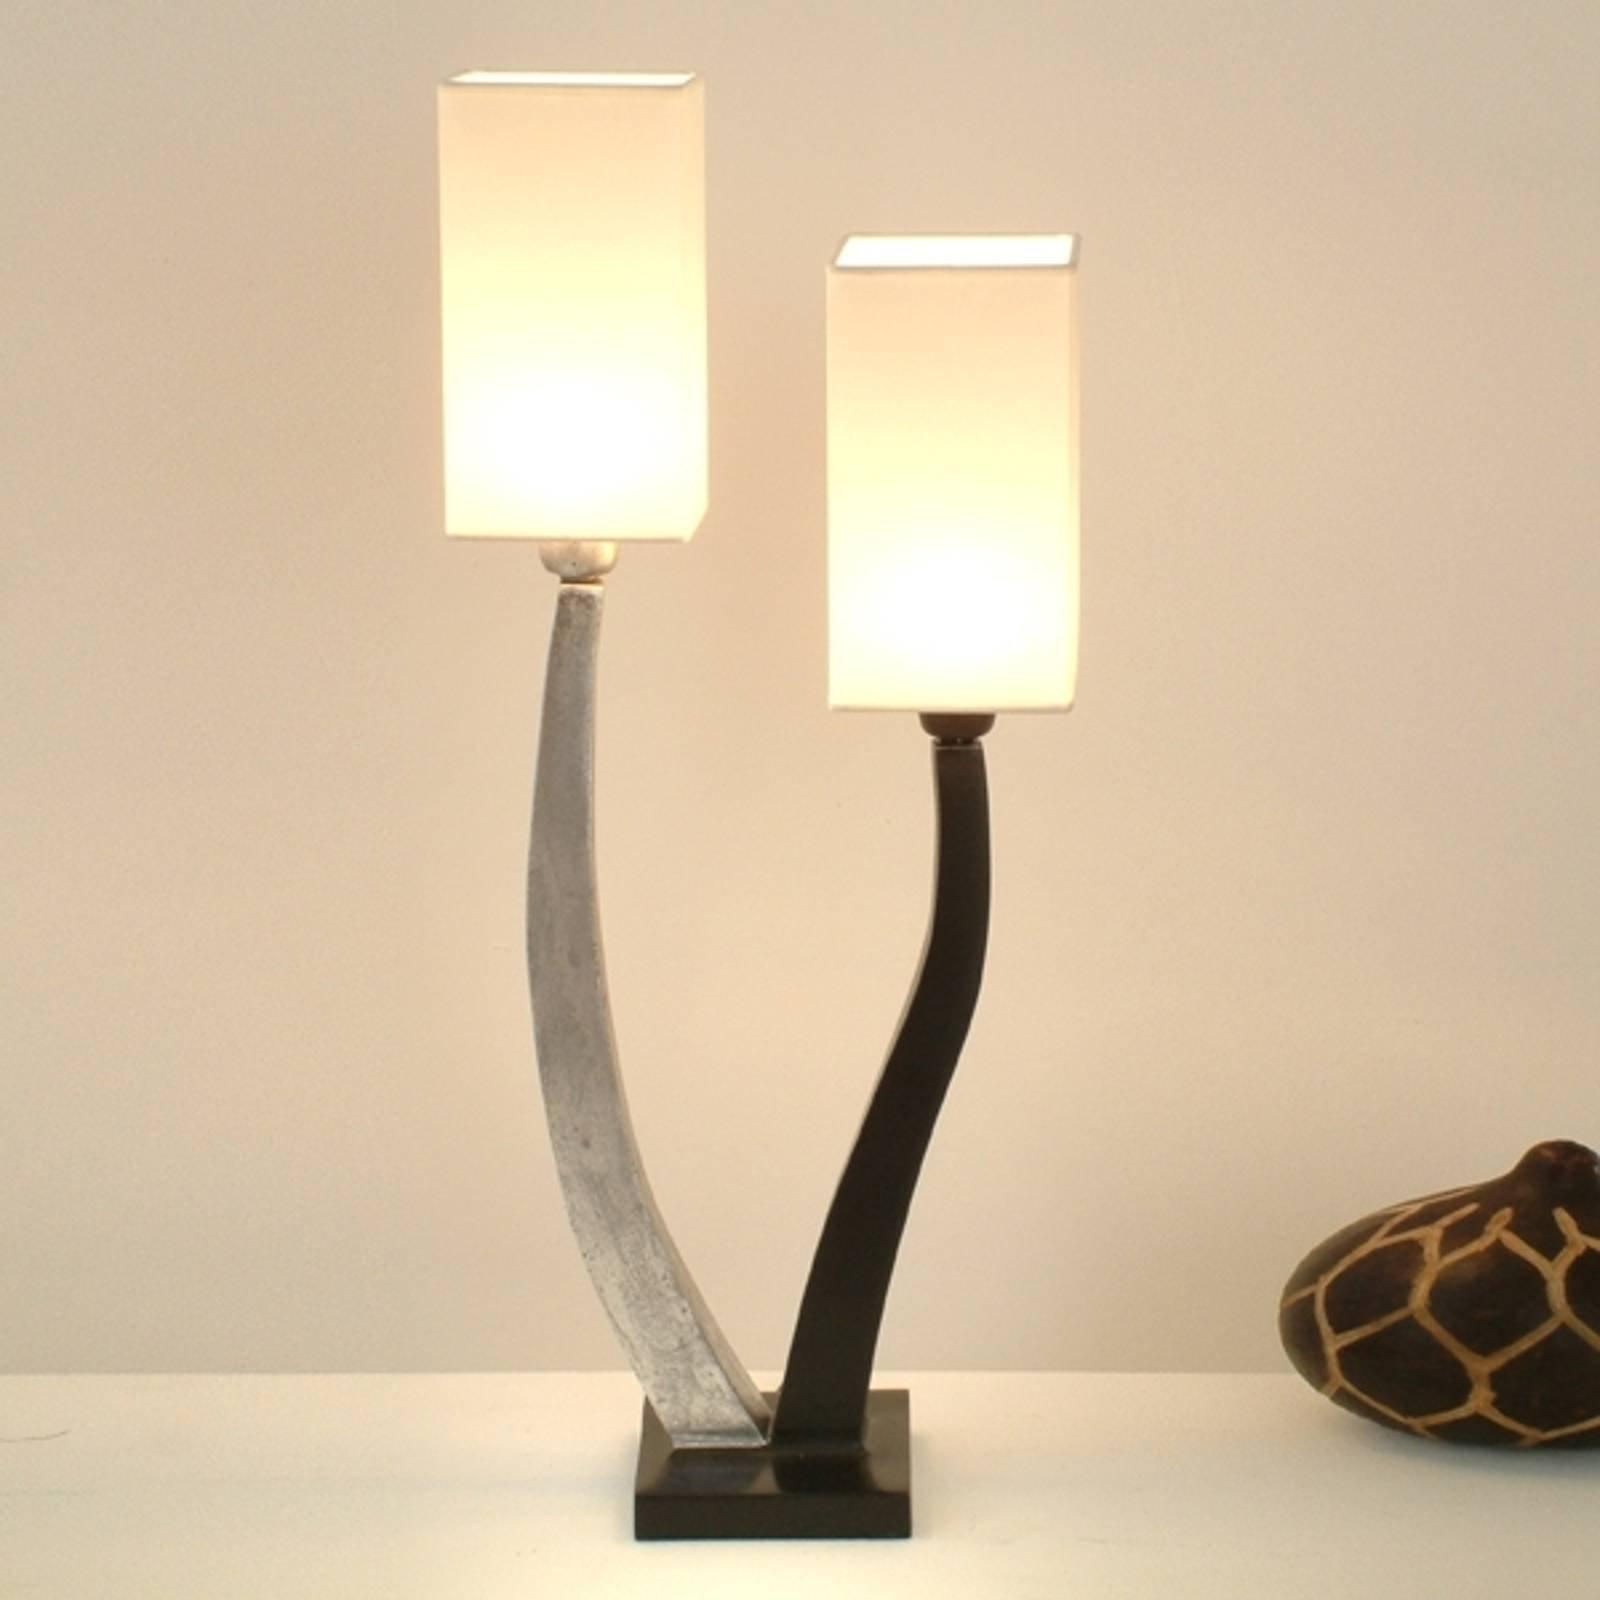 Elegant bordlampe QUADRANGOLARE - sølv med to lys